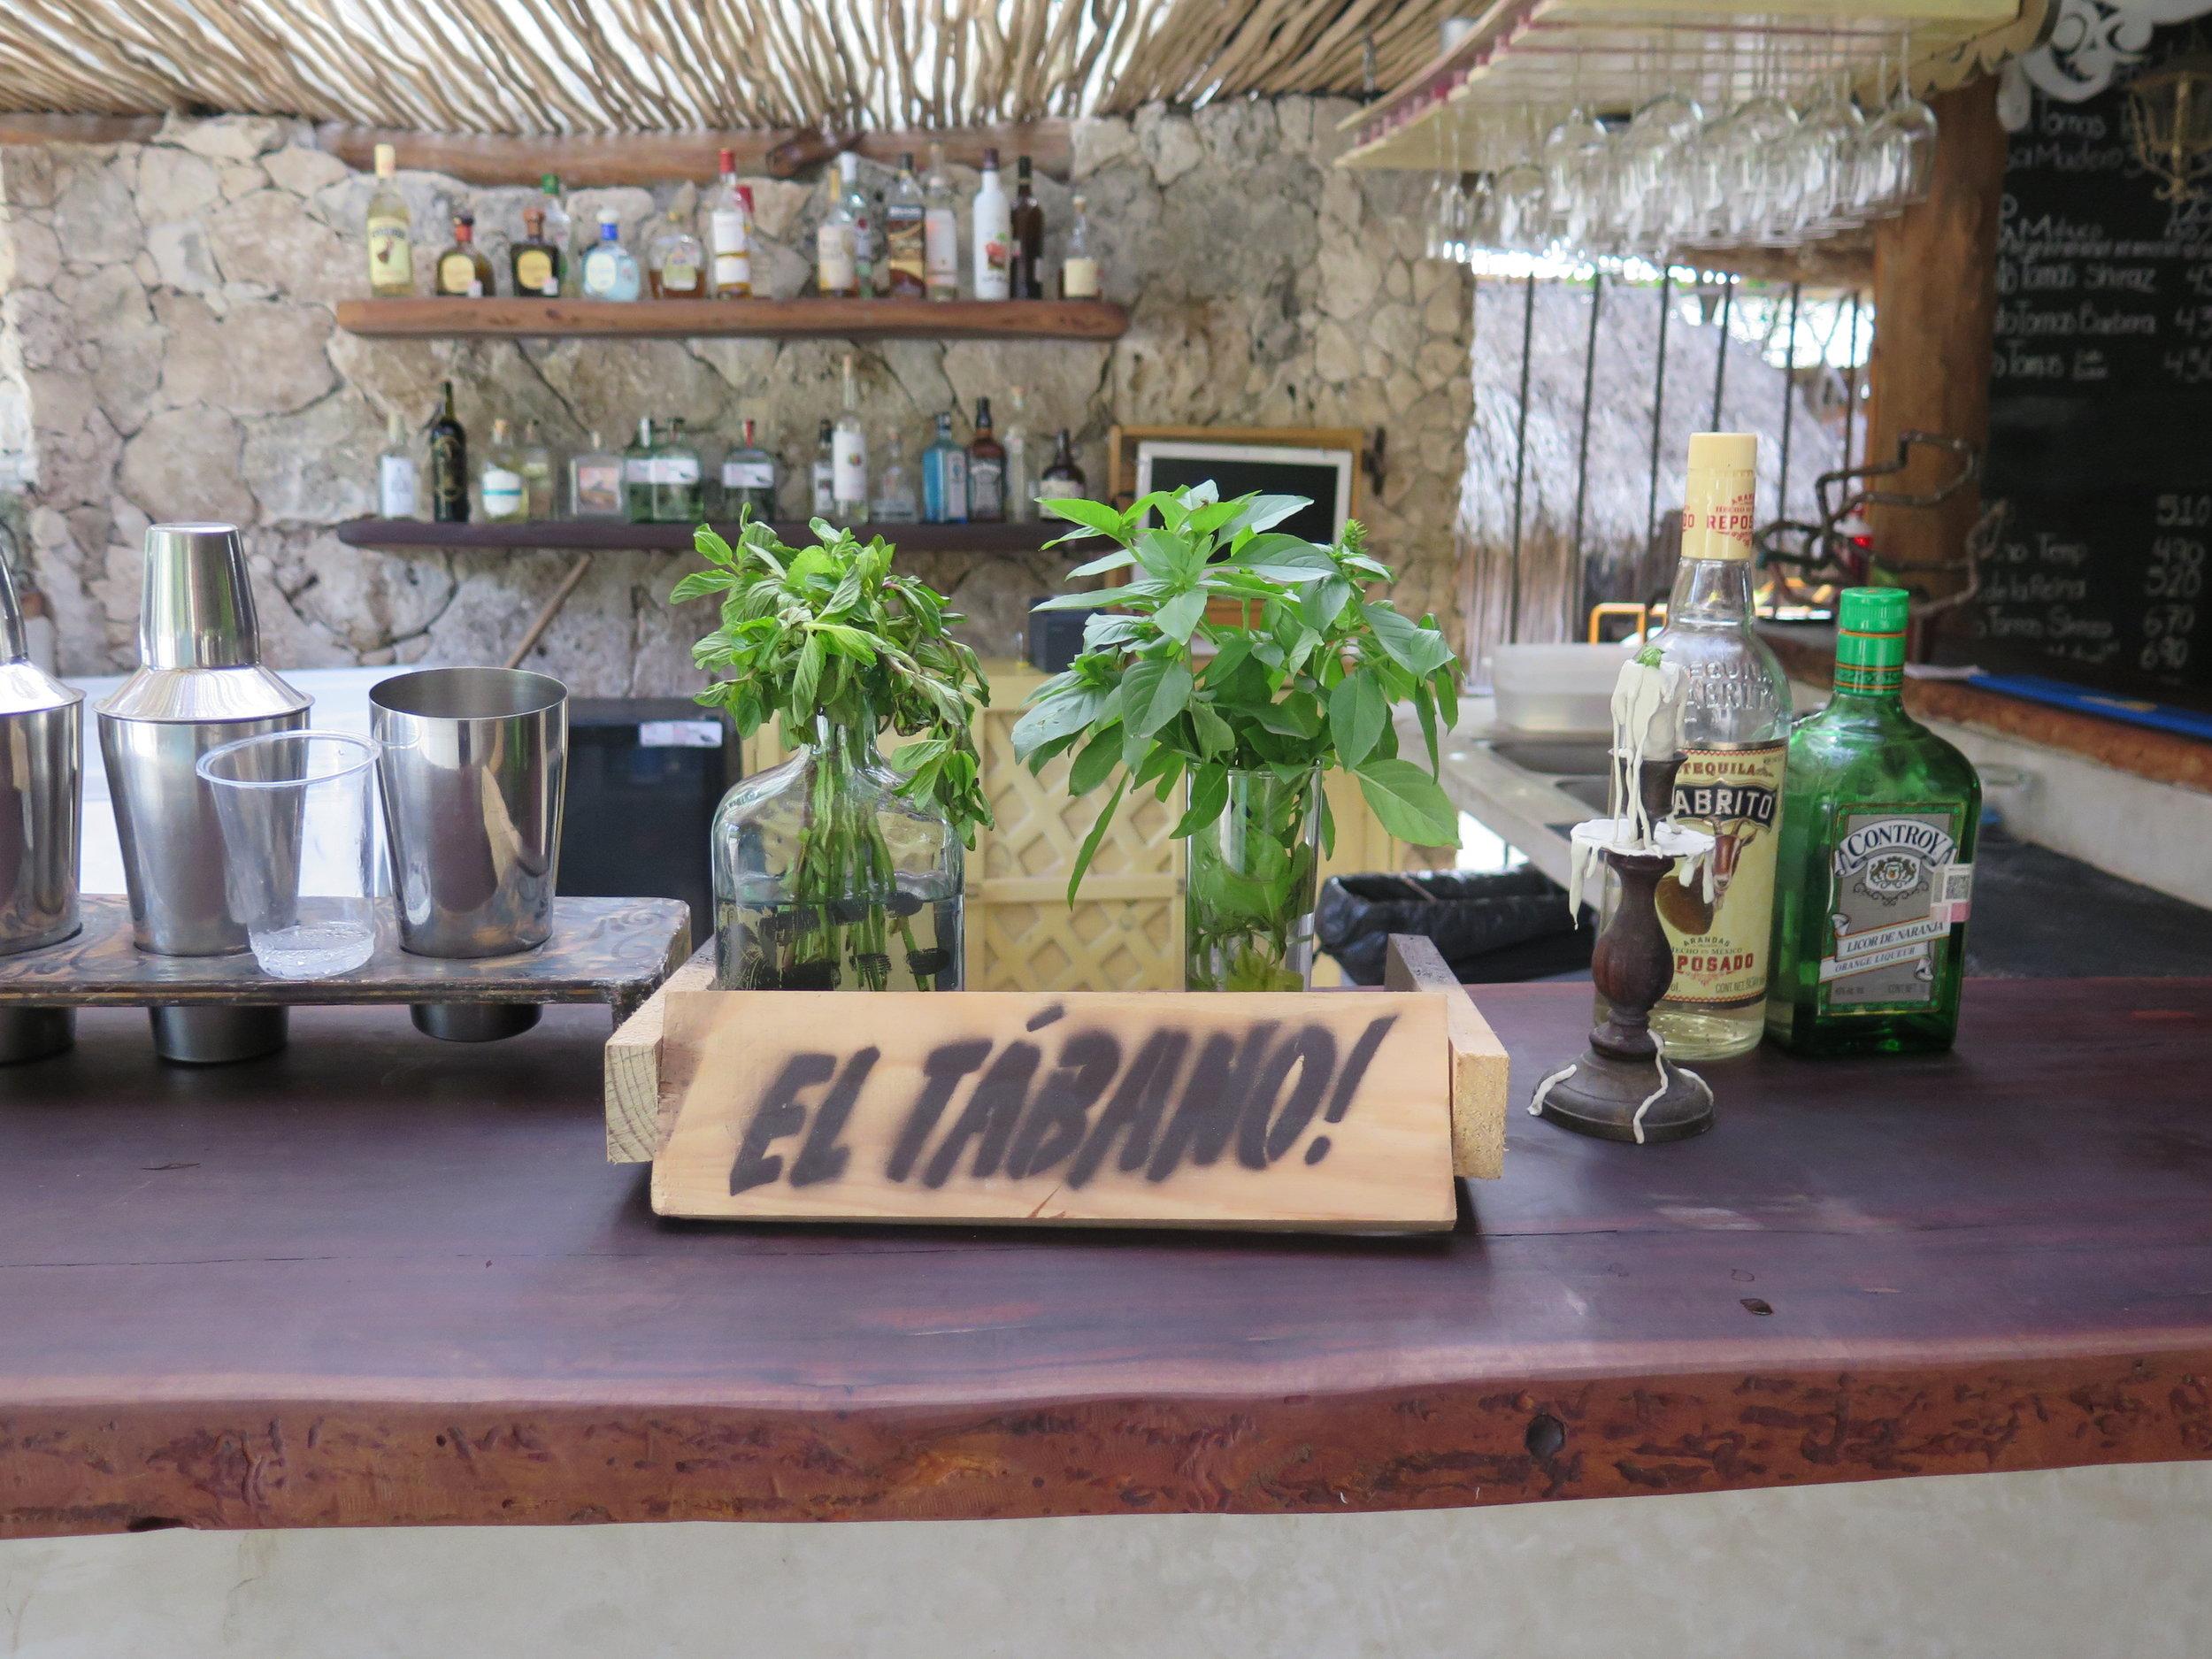 El Tabano, nice lunch spot